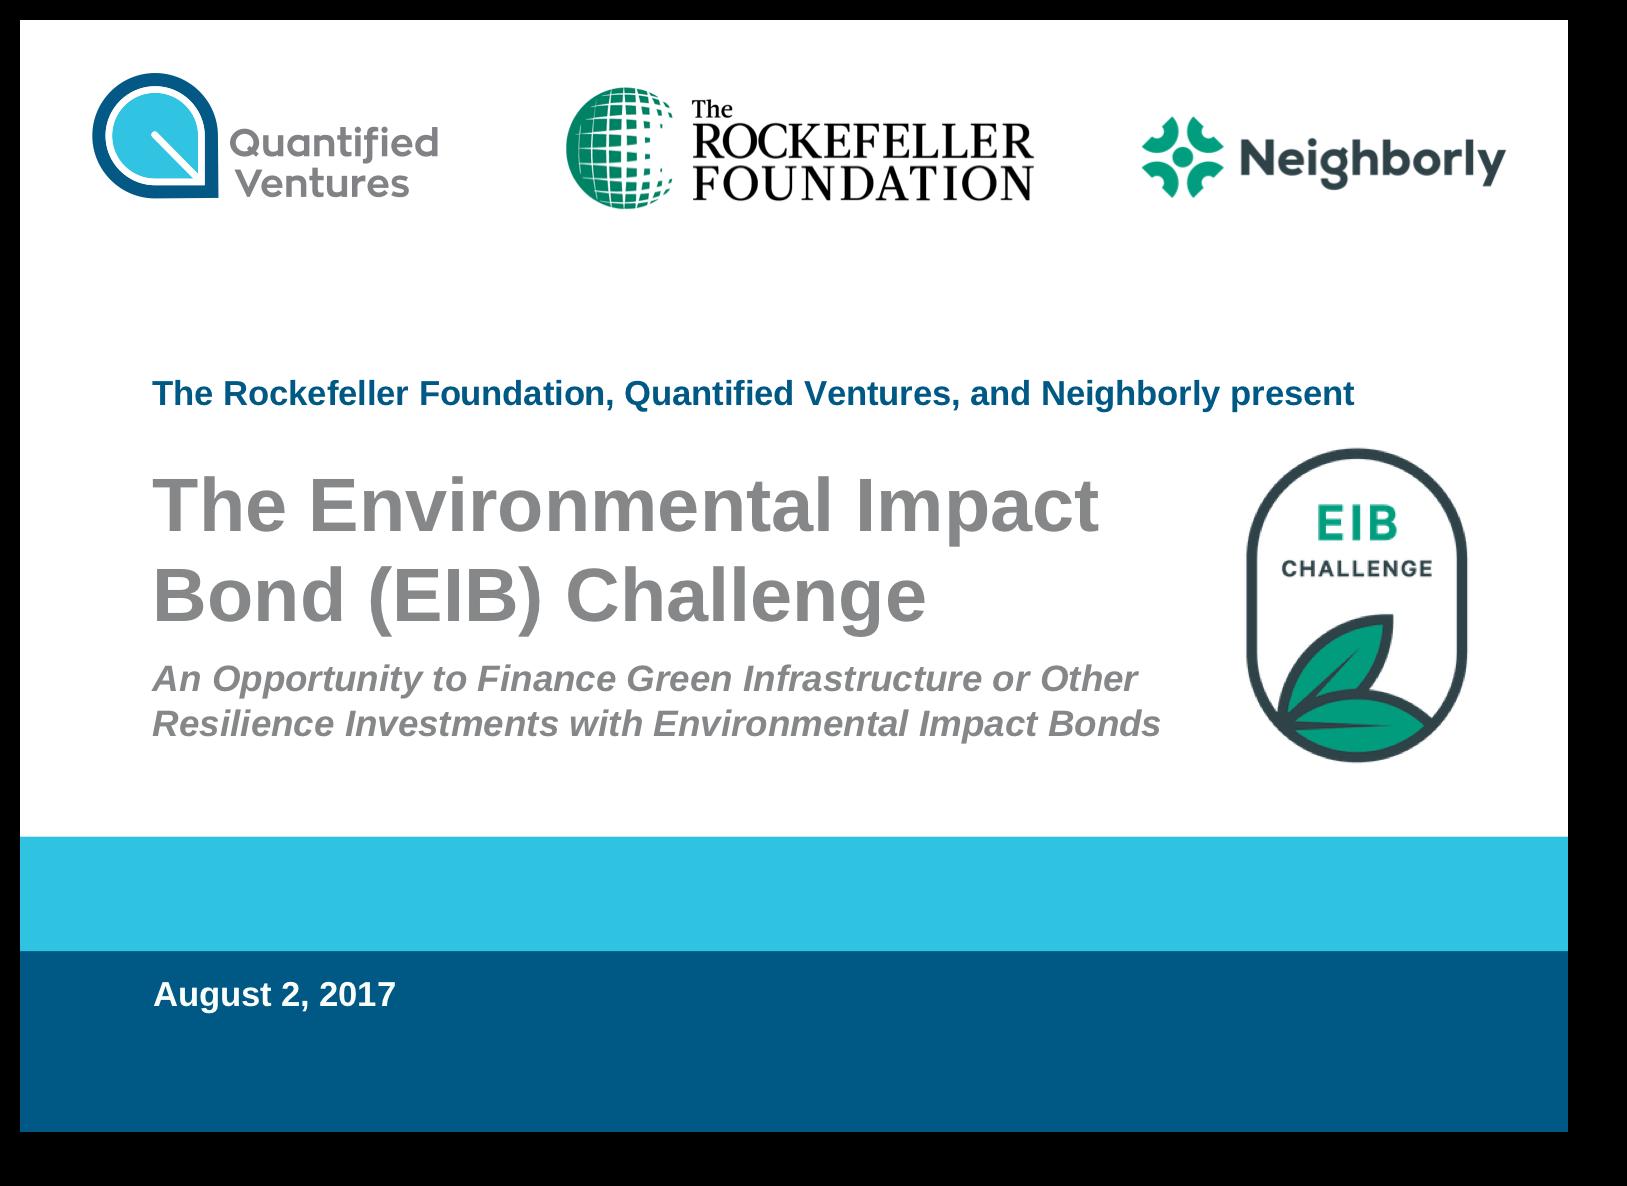 8/2/17 Webinar on EIB Challenge and RFP Process